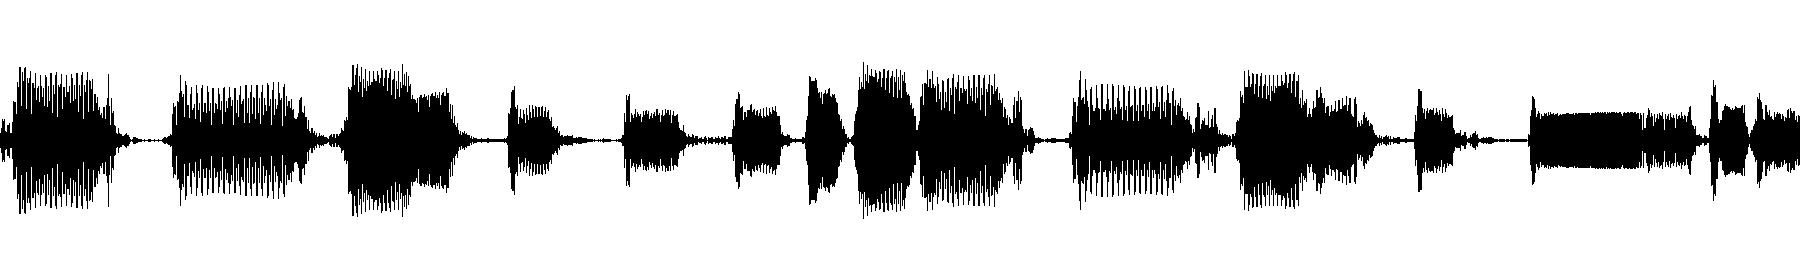 blbc jazzyripper 95 c